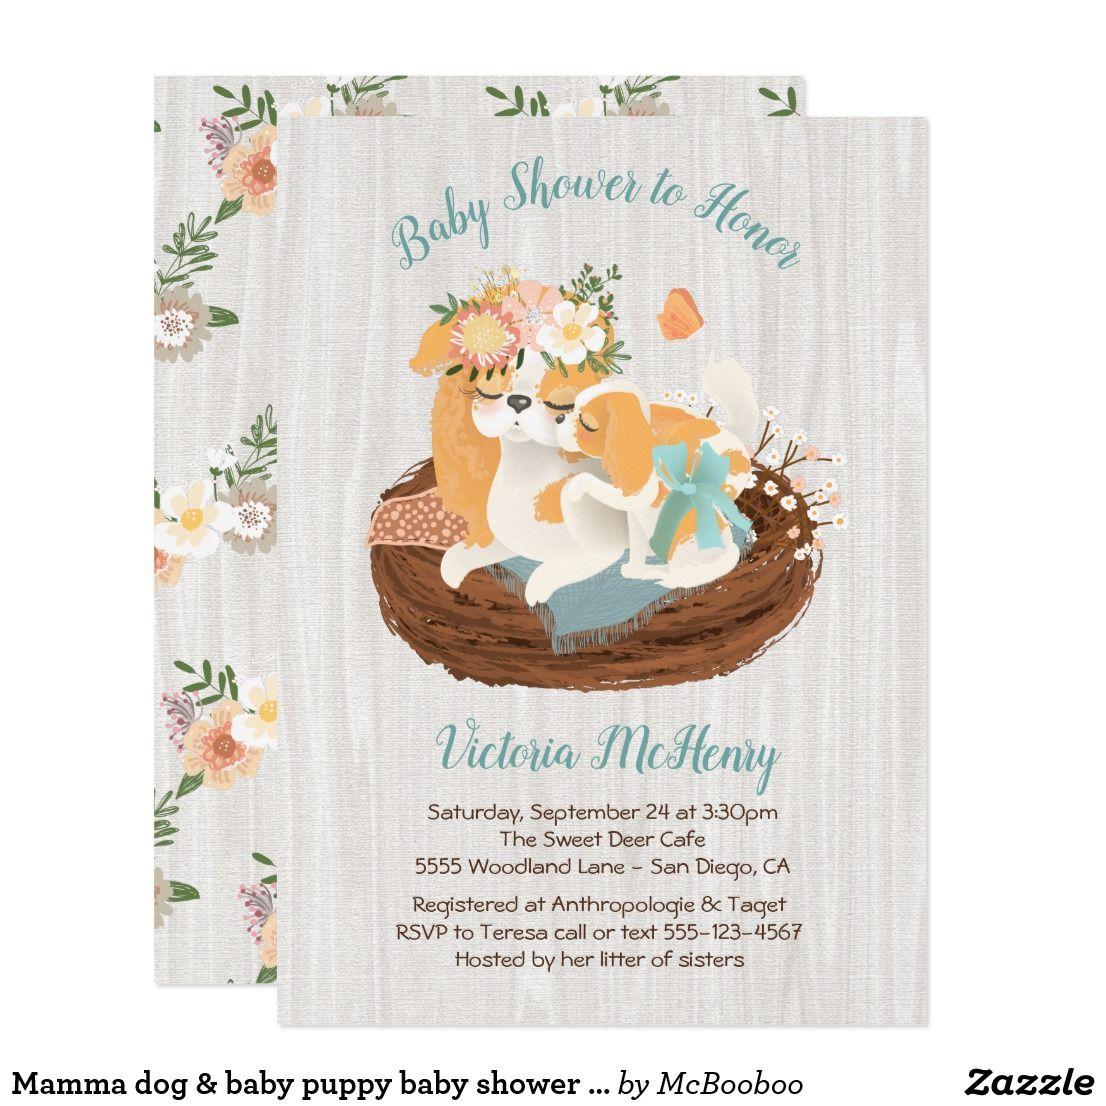 Mamma dog & baby puppy baby shower invitations | Shower invitations